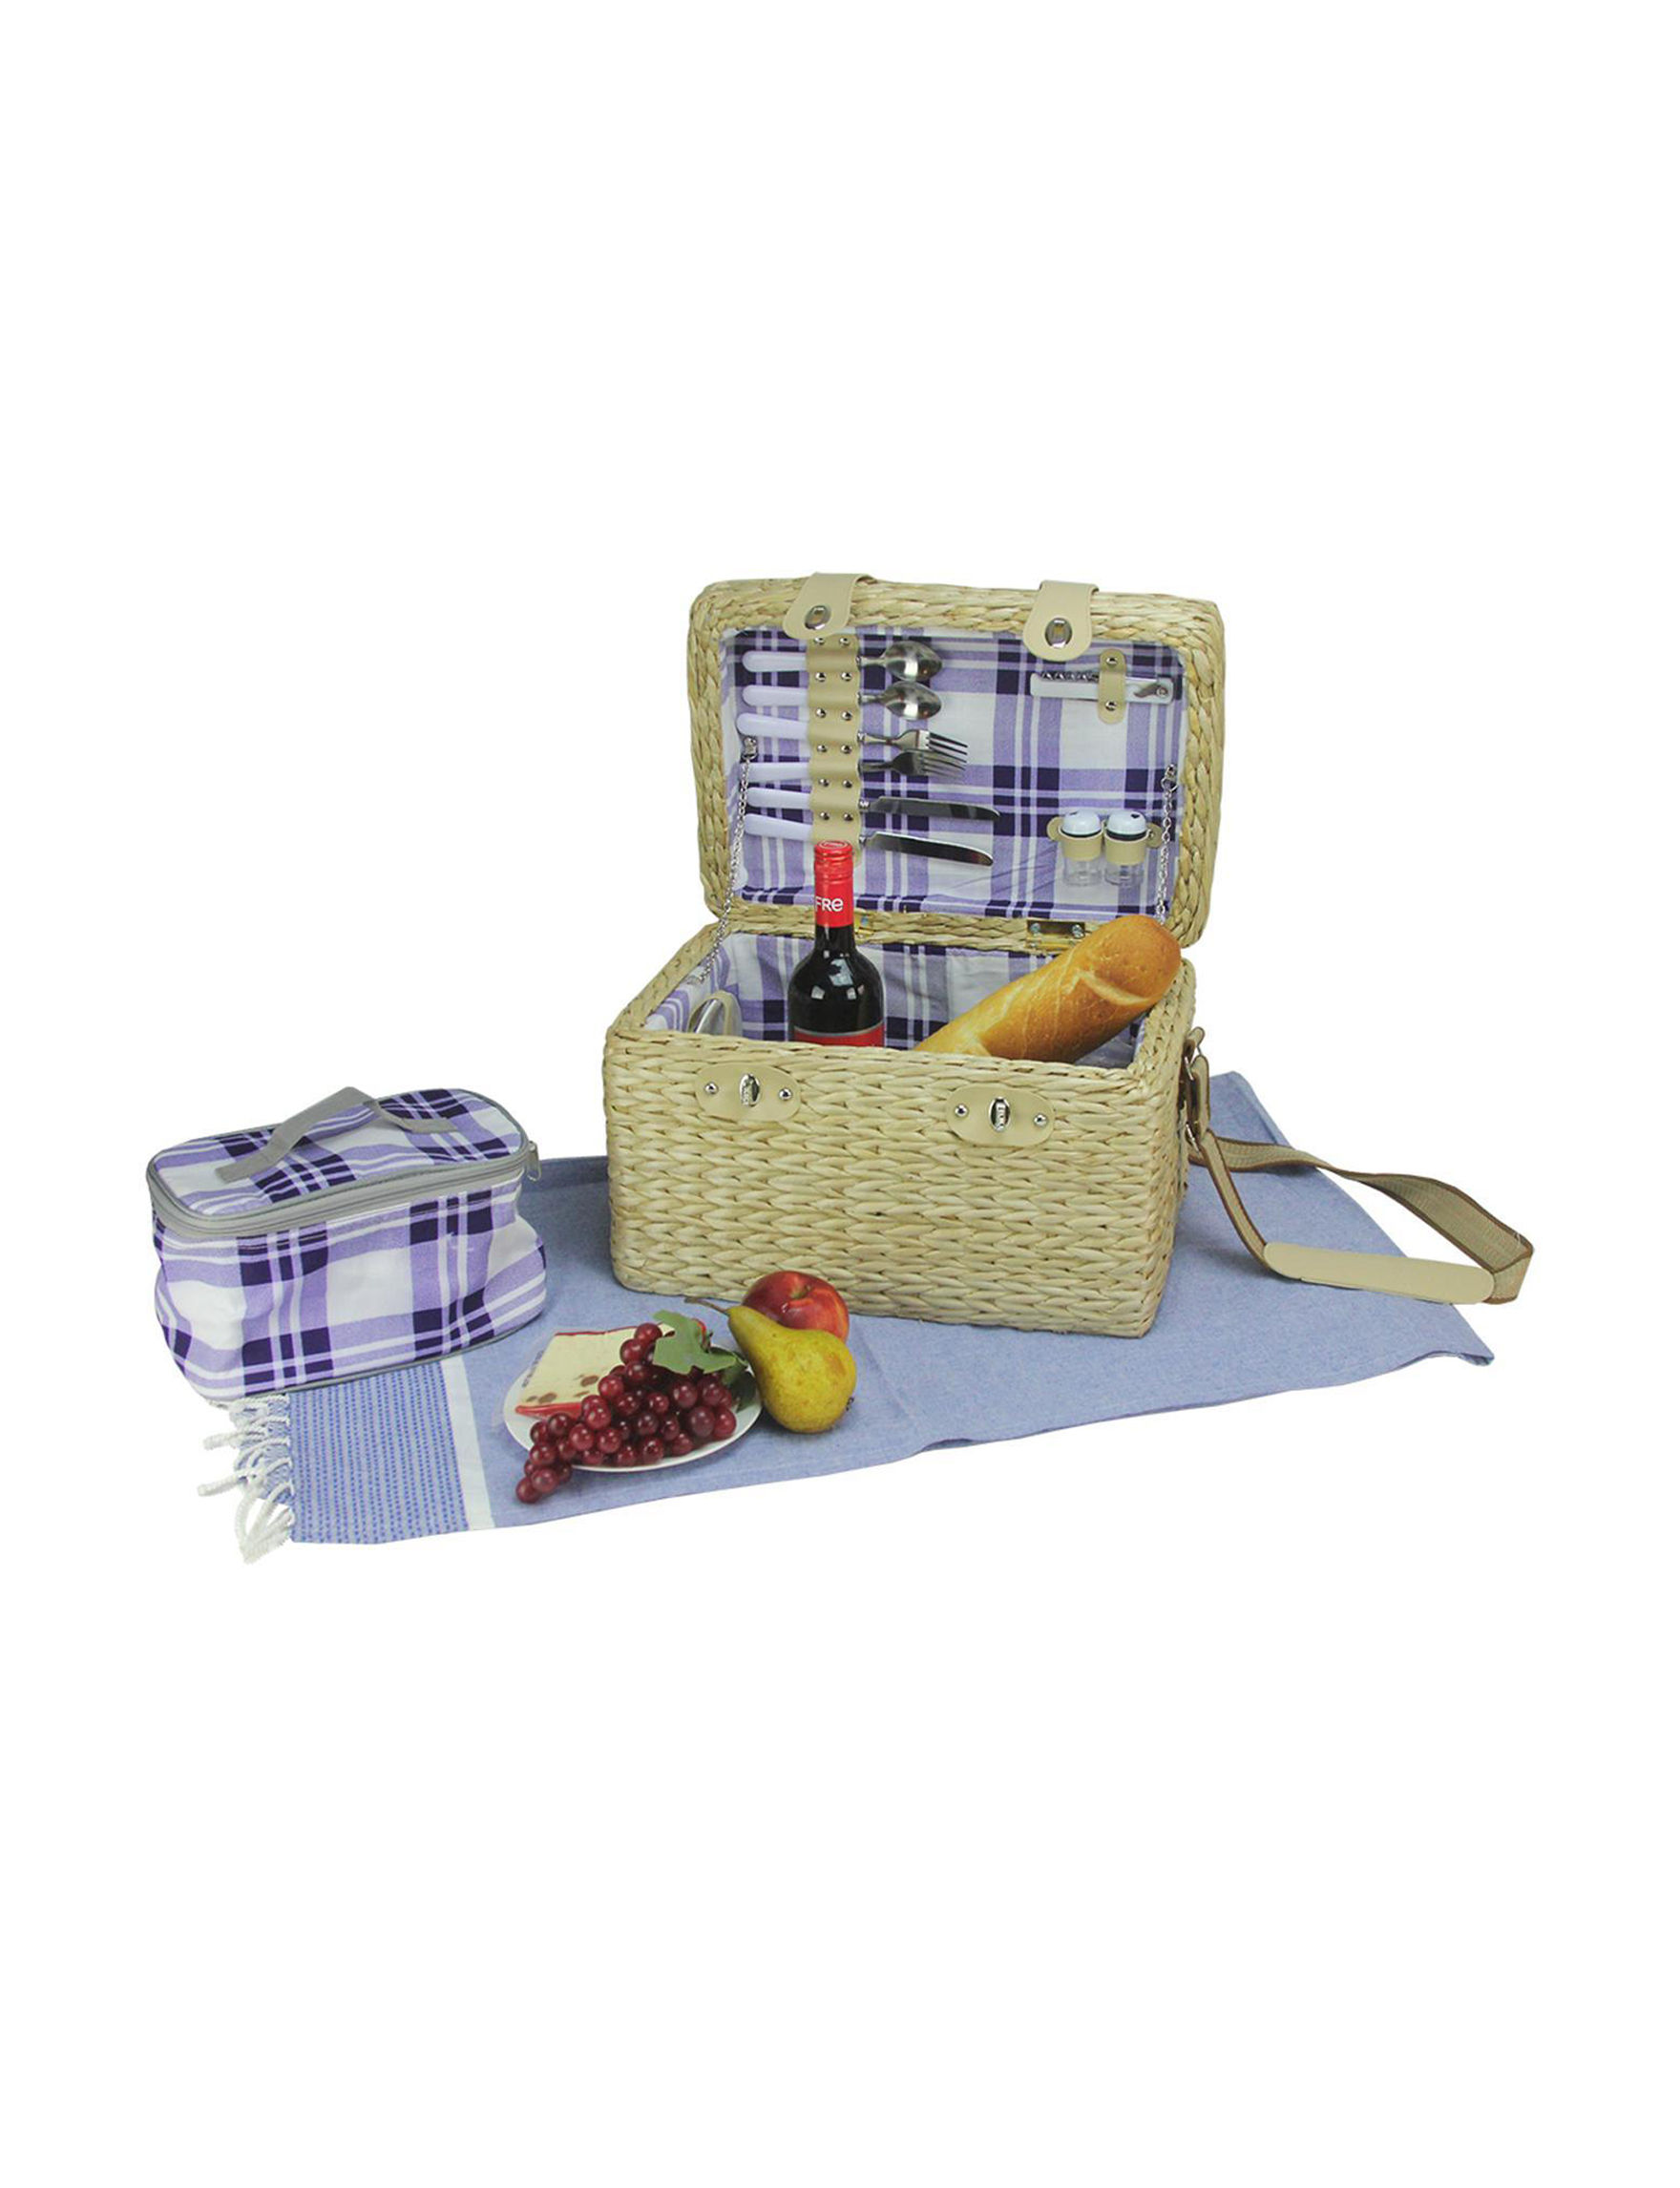 Northlight Brown / Purple Baskets Outdoor Entertaining